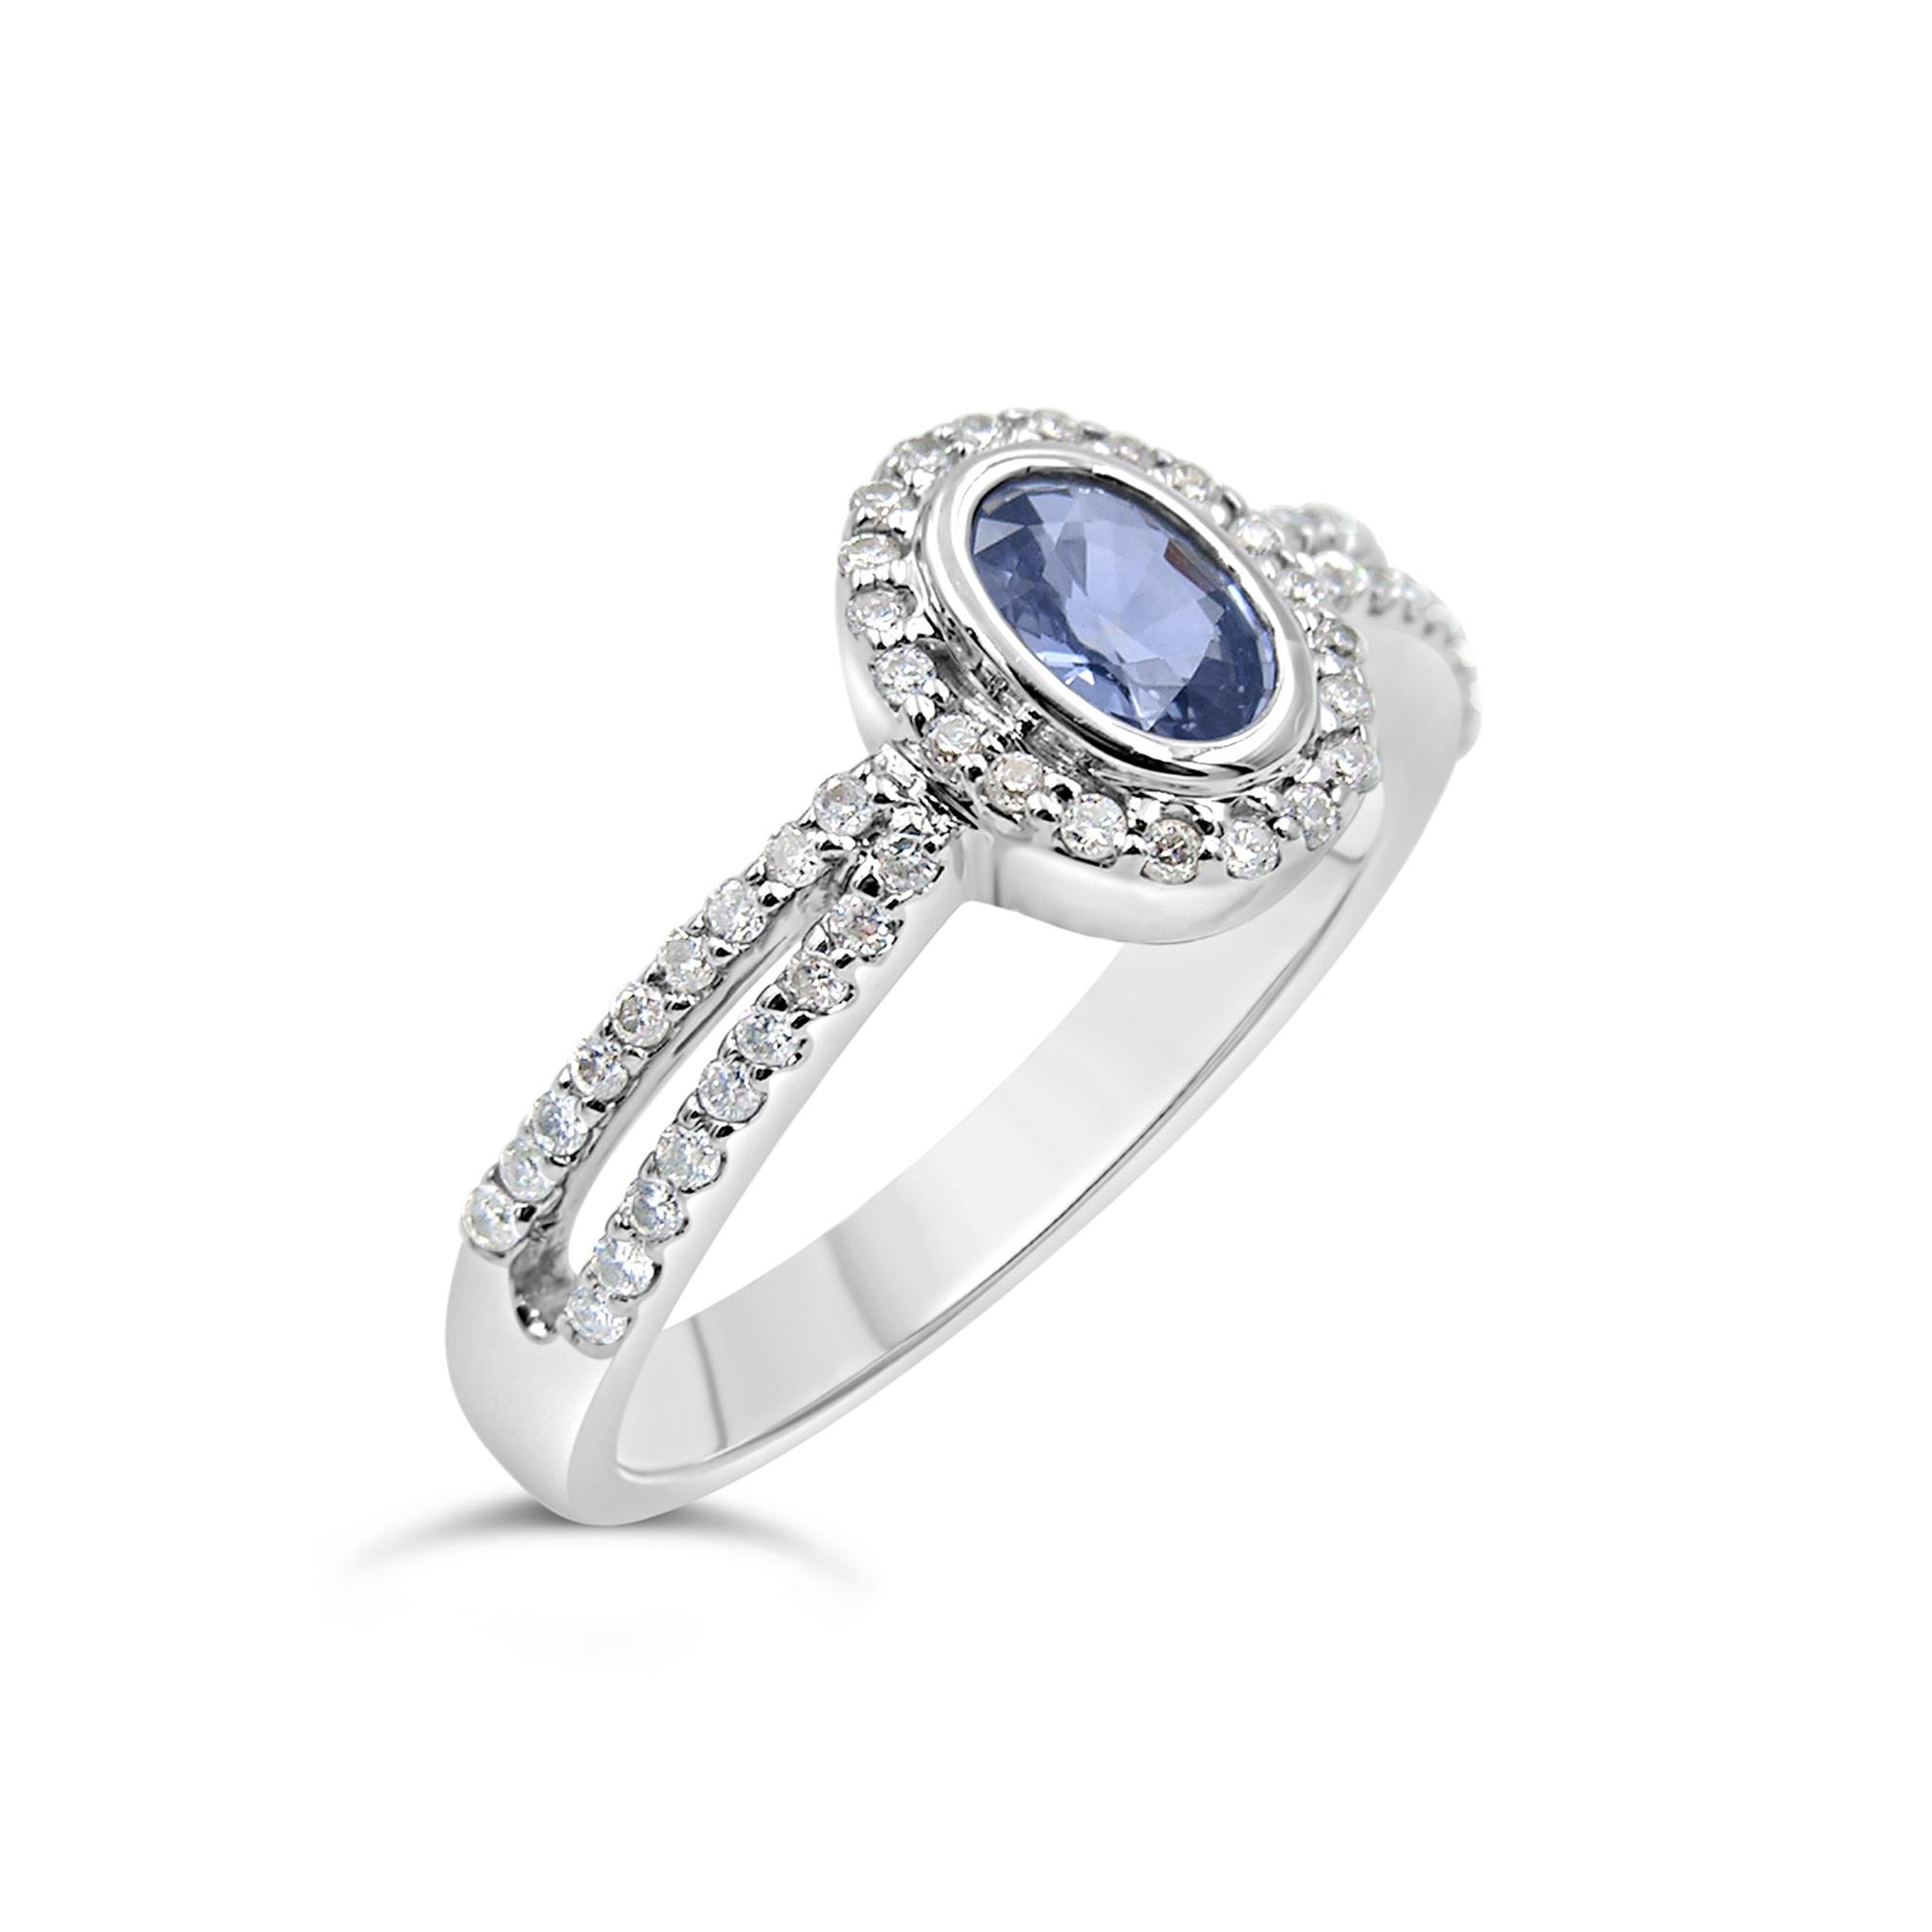 18 karat white gold ring with 0.29 ct diamonds  & 0.49 ct sapphire